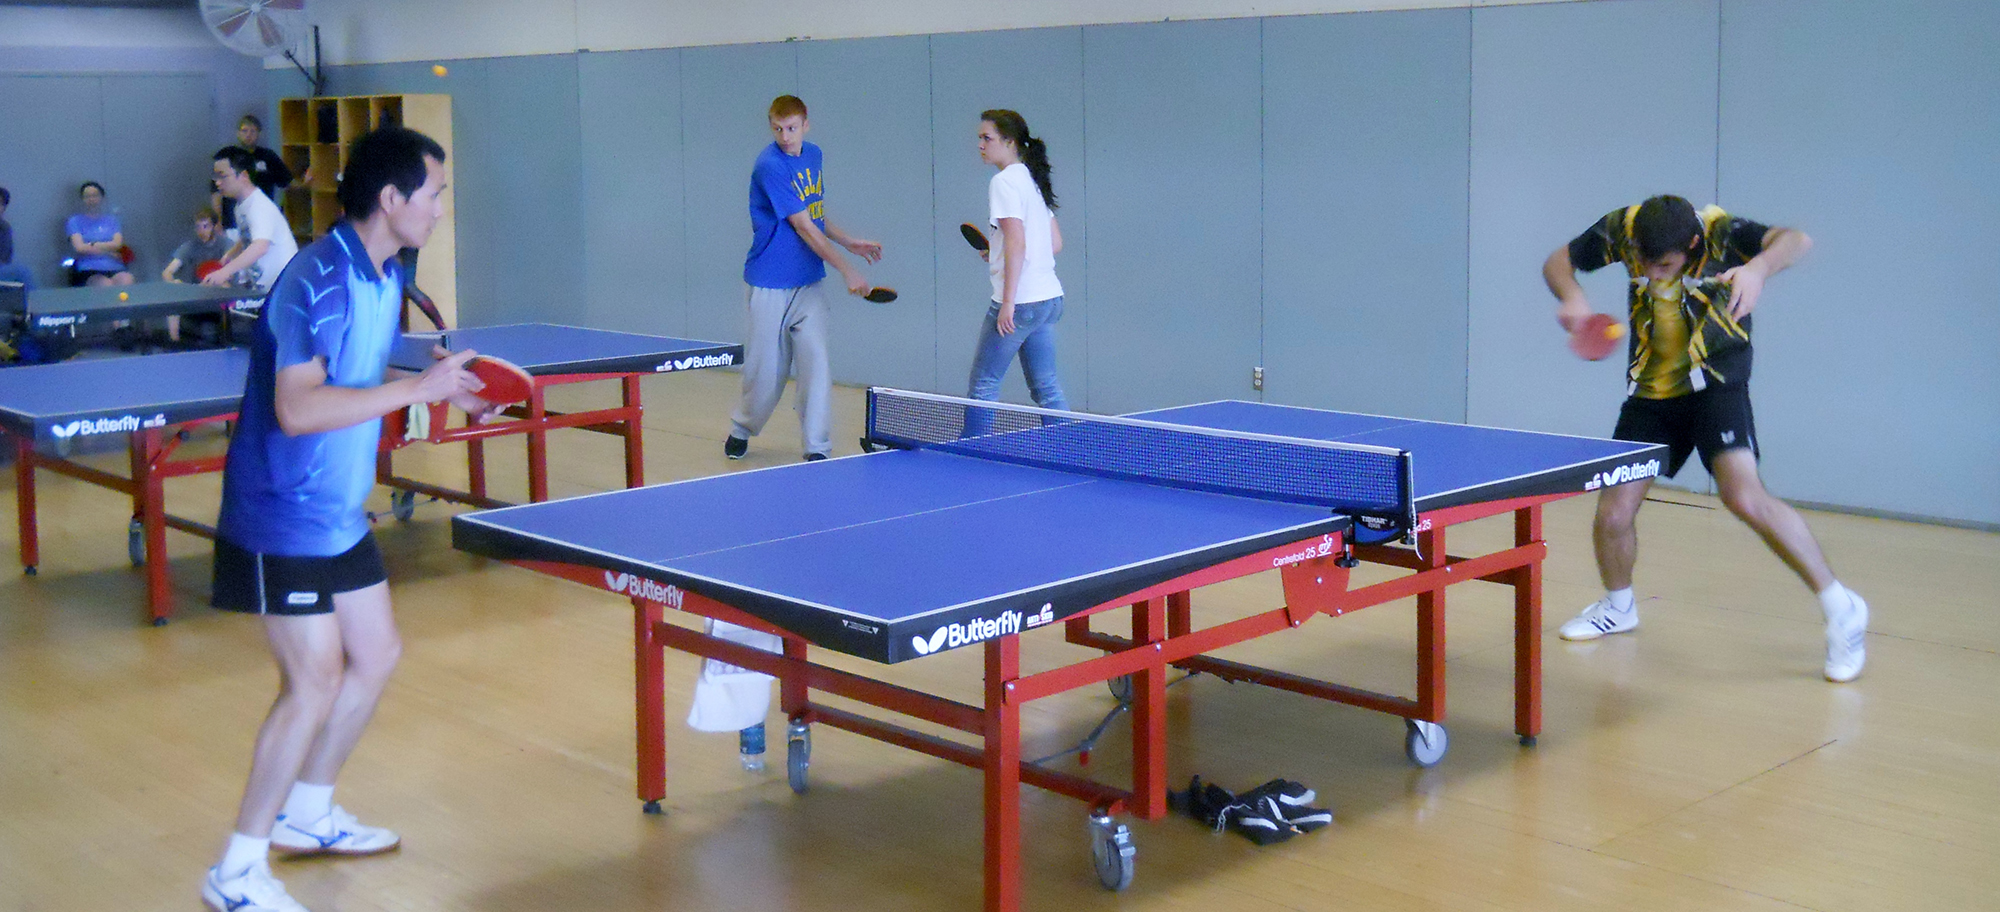 Table tennis office sport